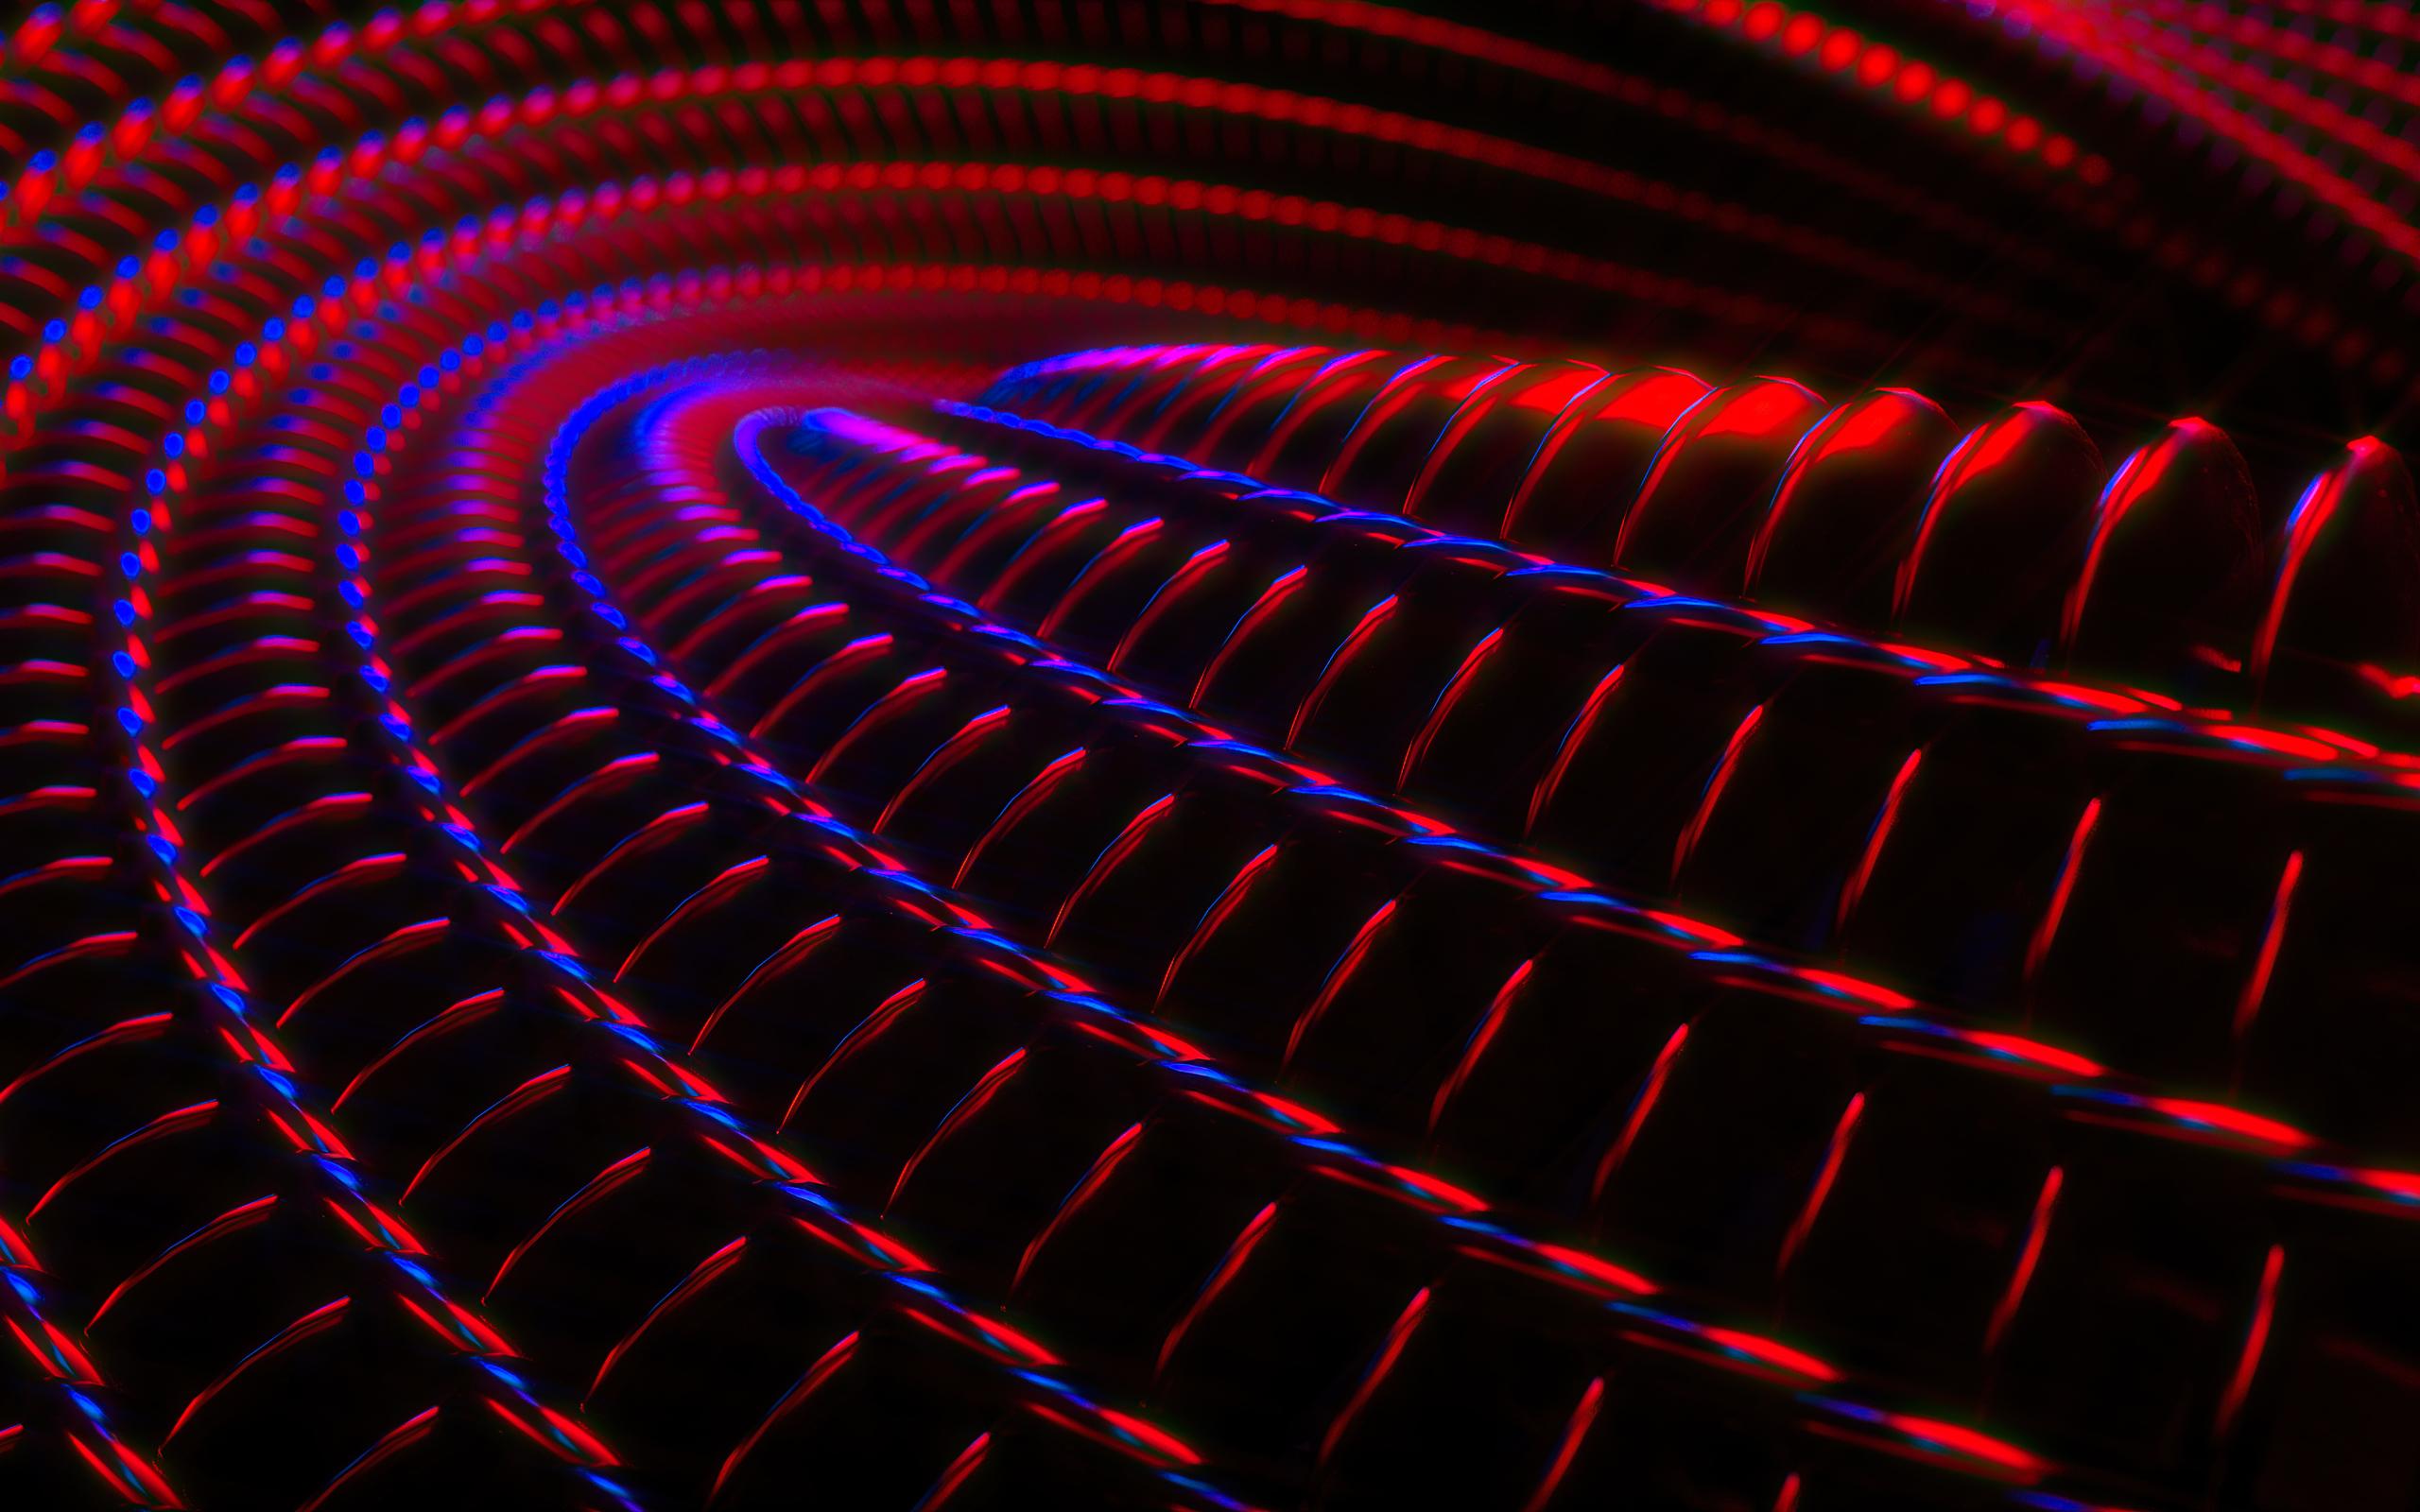 octarender-cinema-abstract-render-4k-1r.jpg